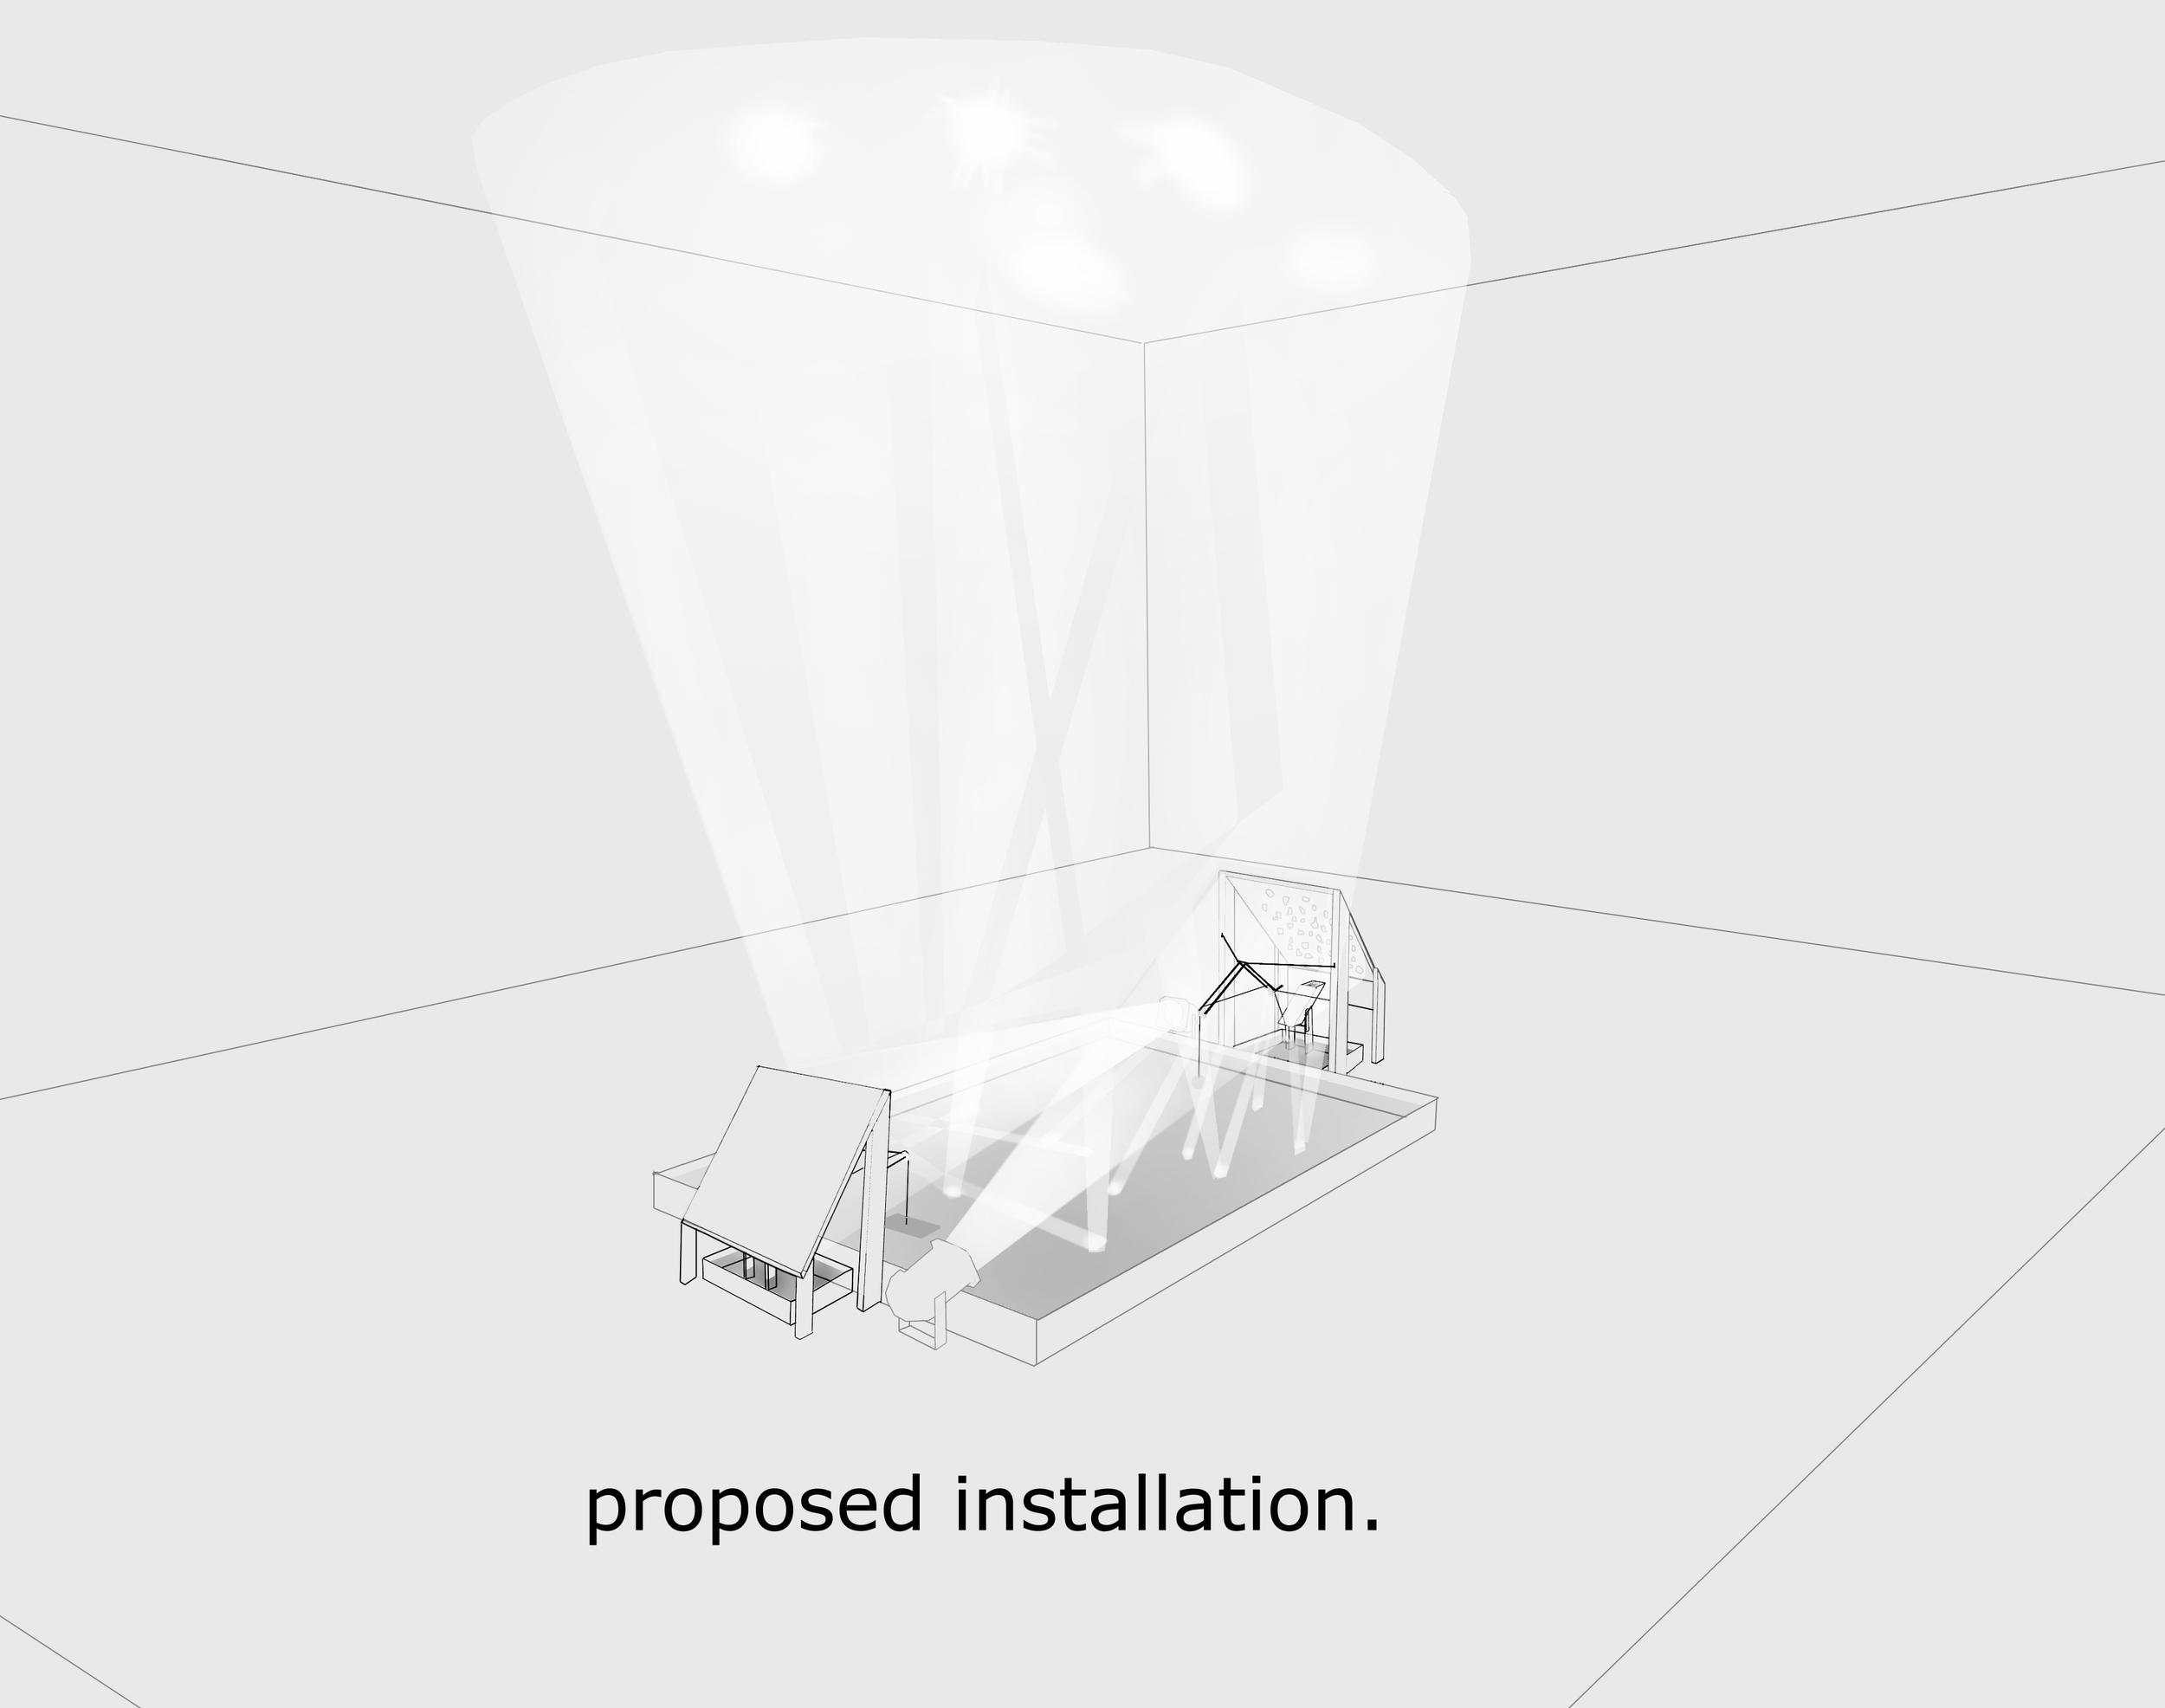 proposal instilation.jpg